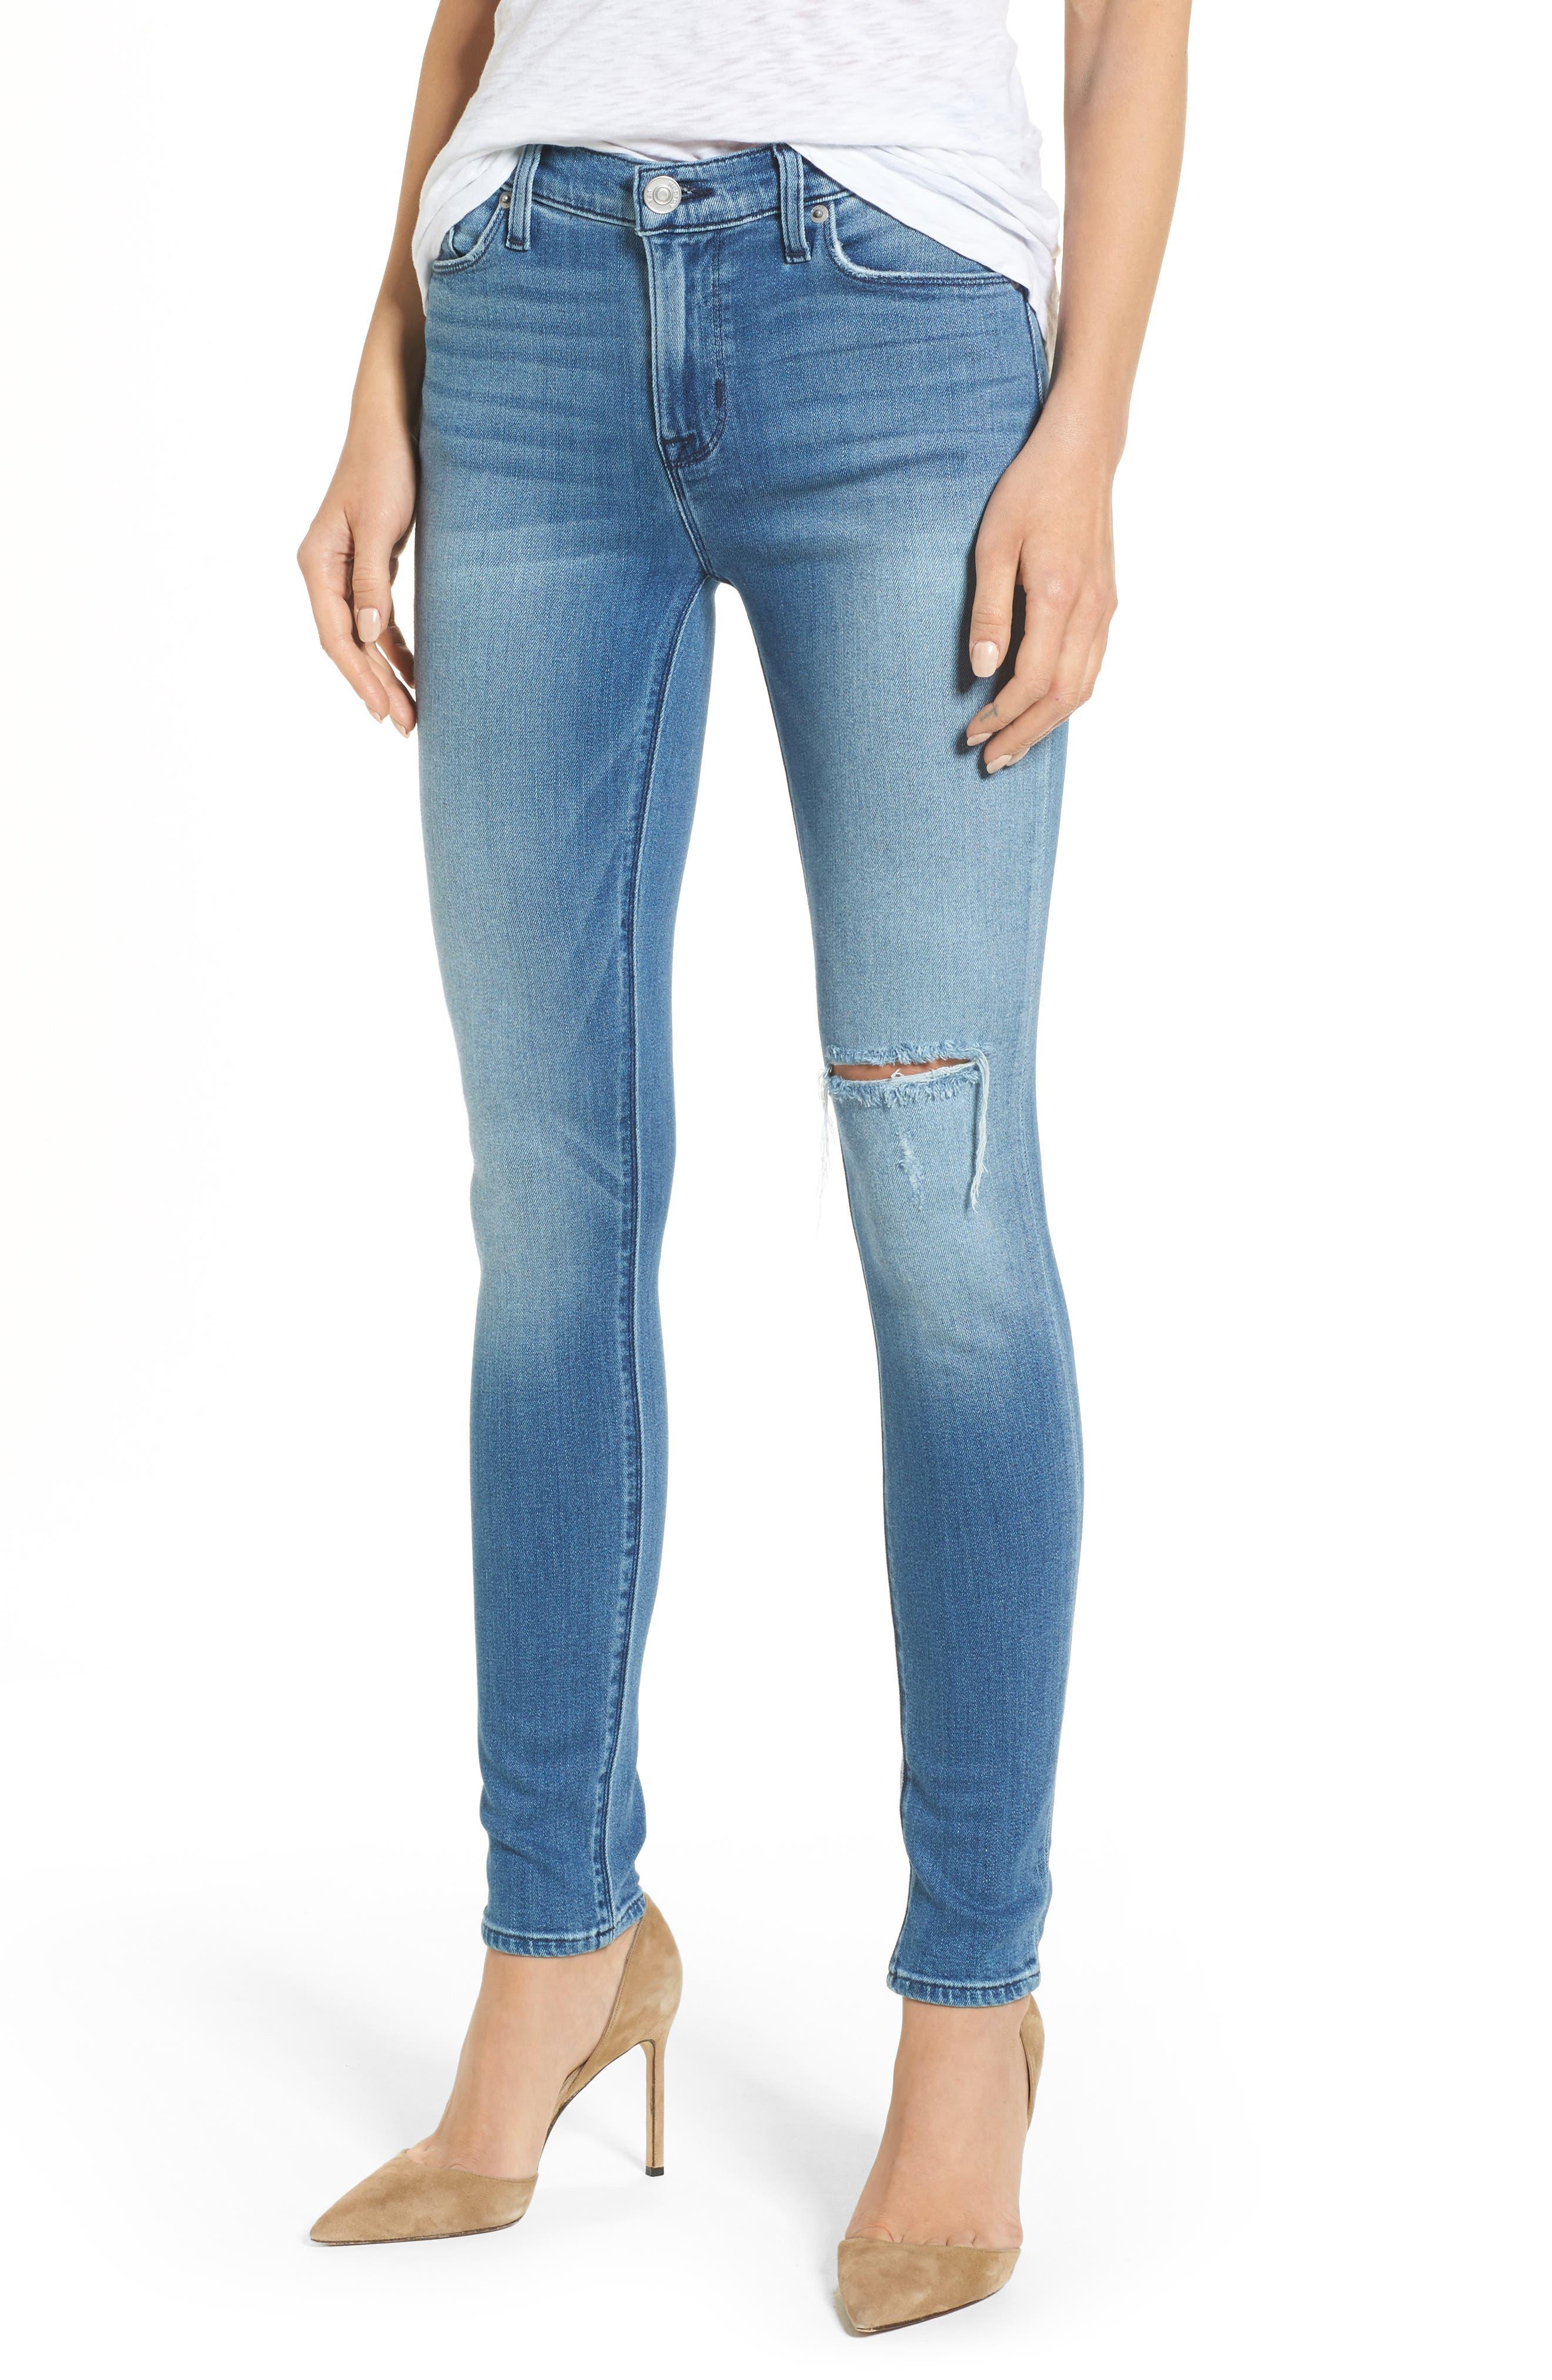 Alternate Image 1 Selected - Hudson Nico Mid Rise Super Skinny Jeans